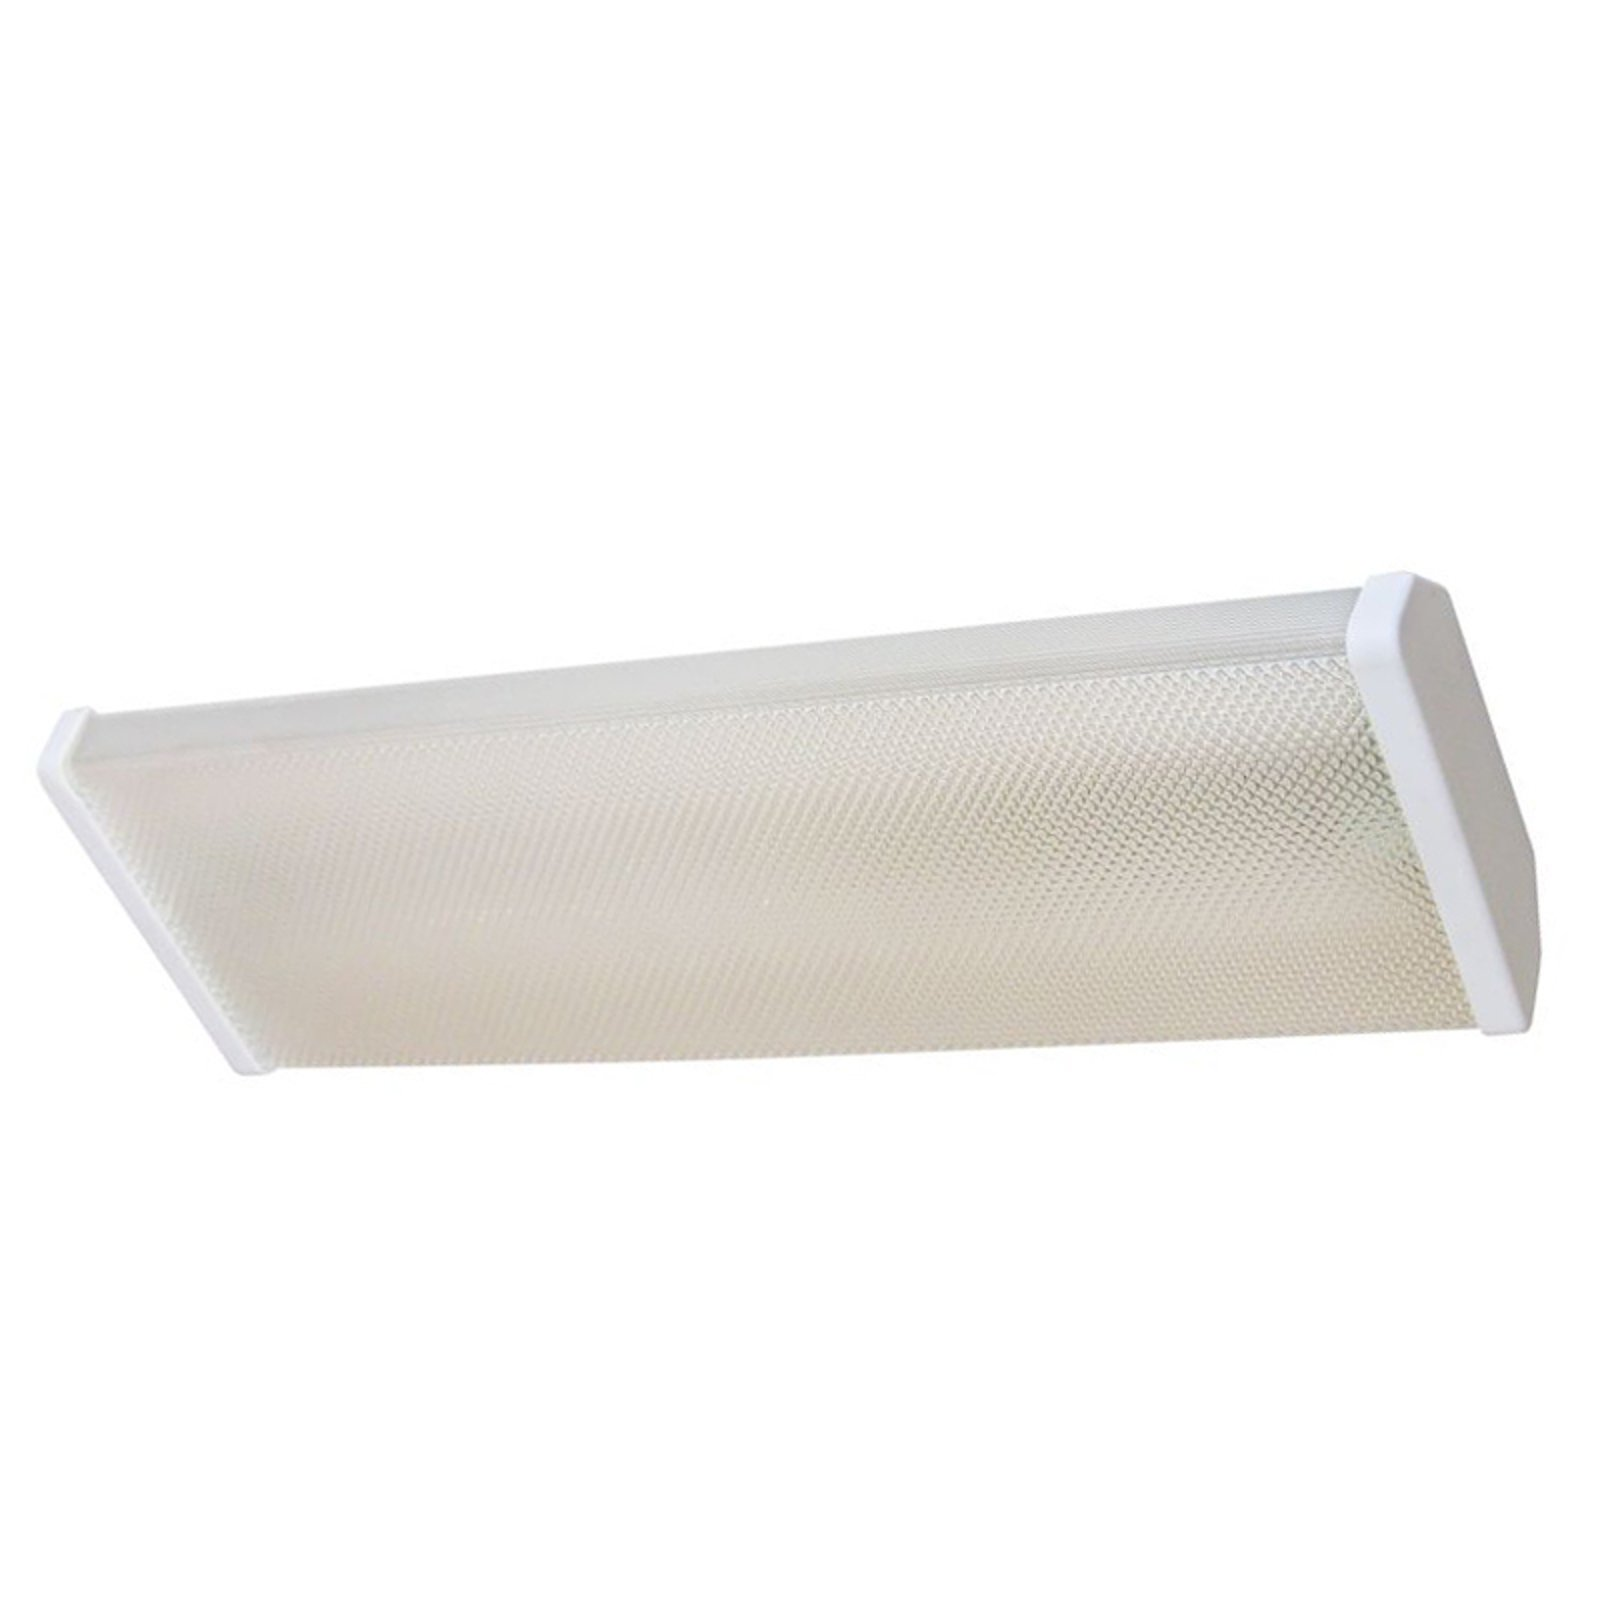 Lavt forbruks taklamper Prismatik LED 22 W